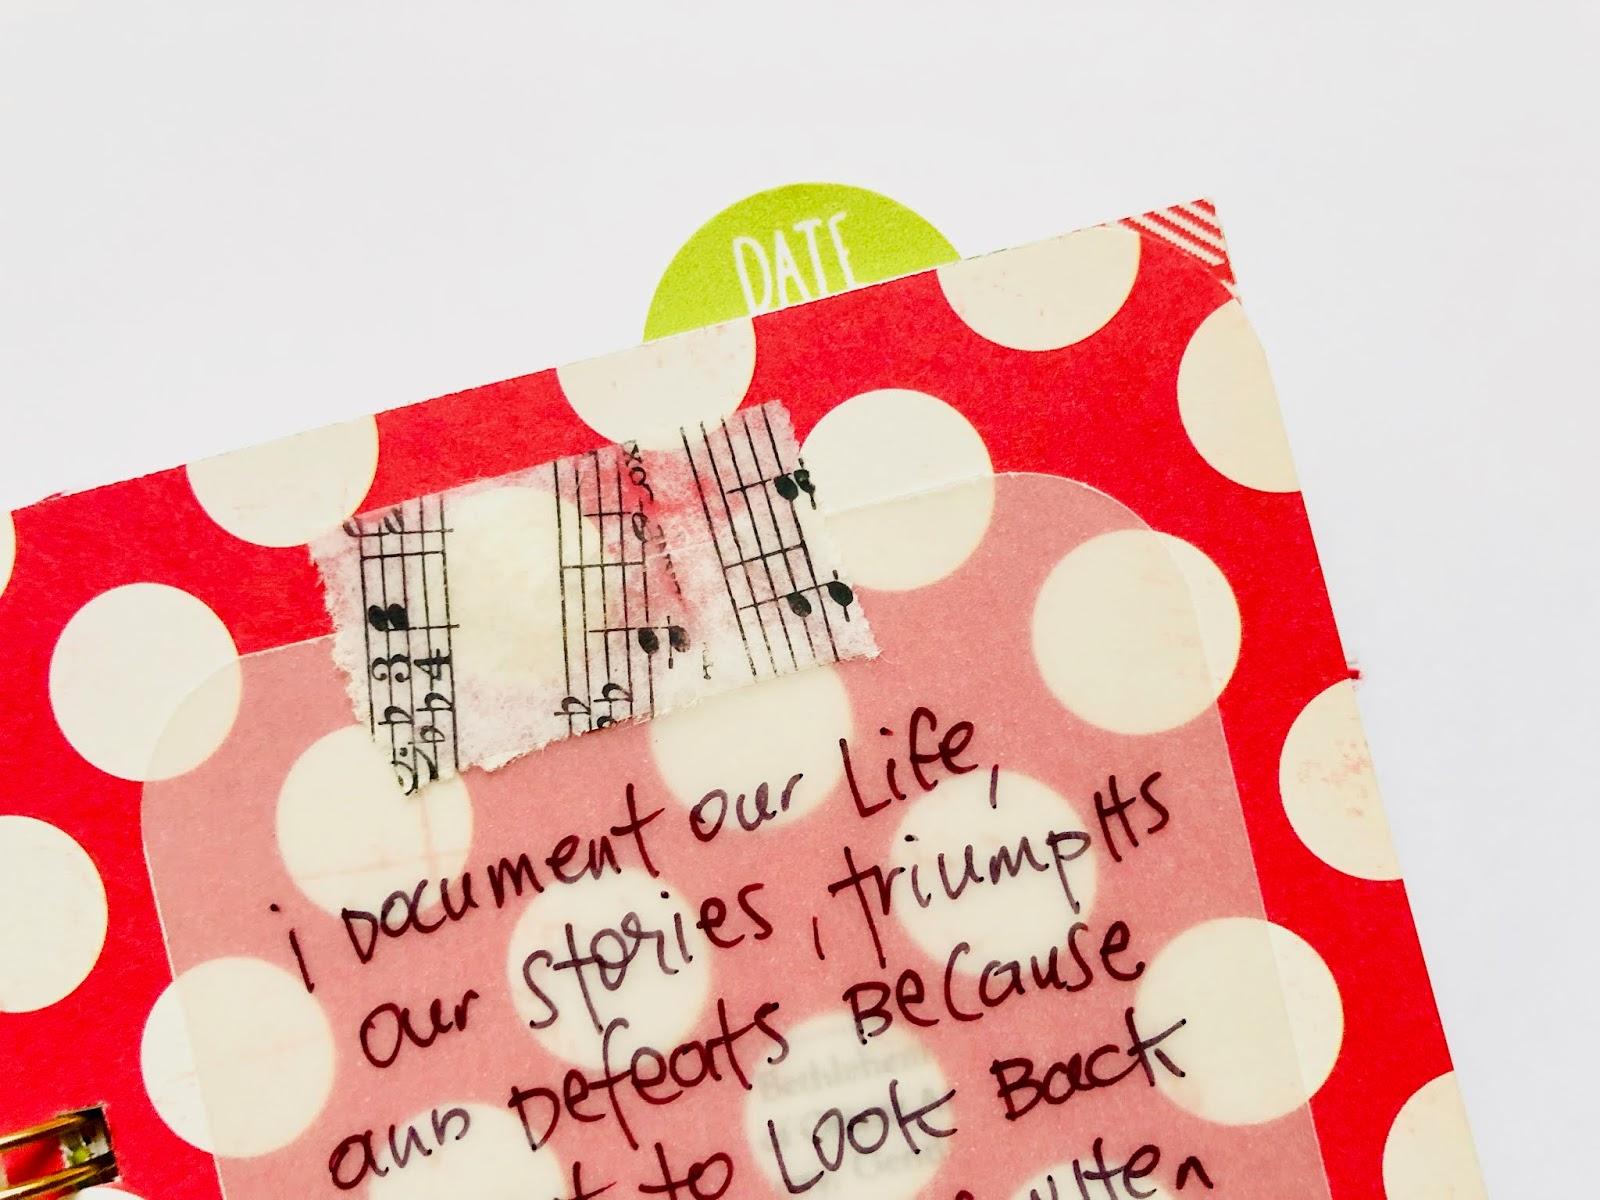 #iloveitallshpo # #30lists #30 Days of Lists #lists #list prompts #listing challenge #junk journal #mini book